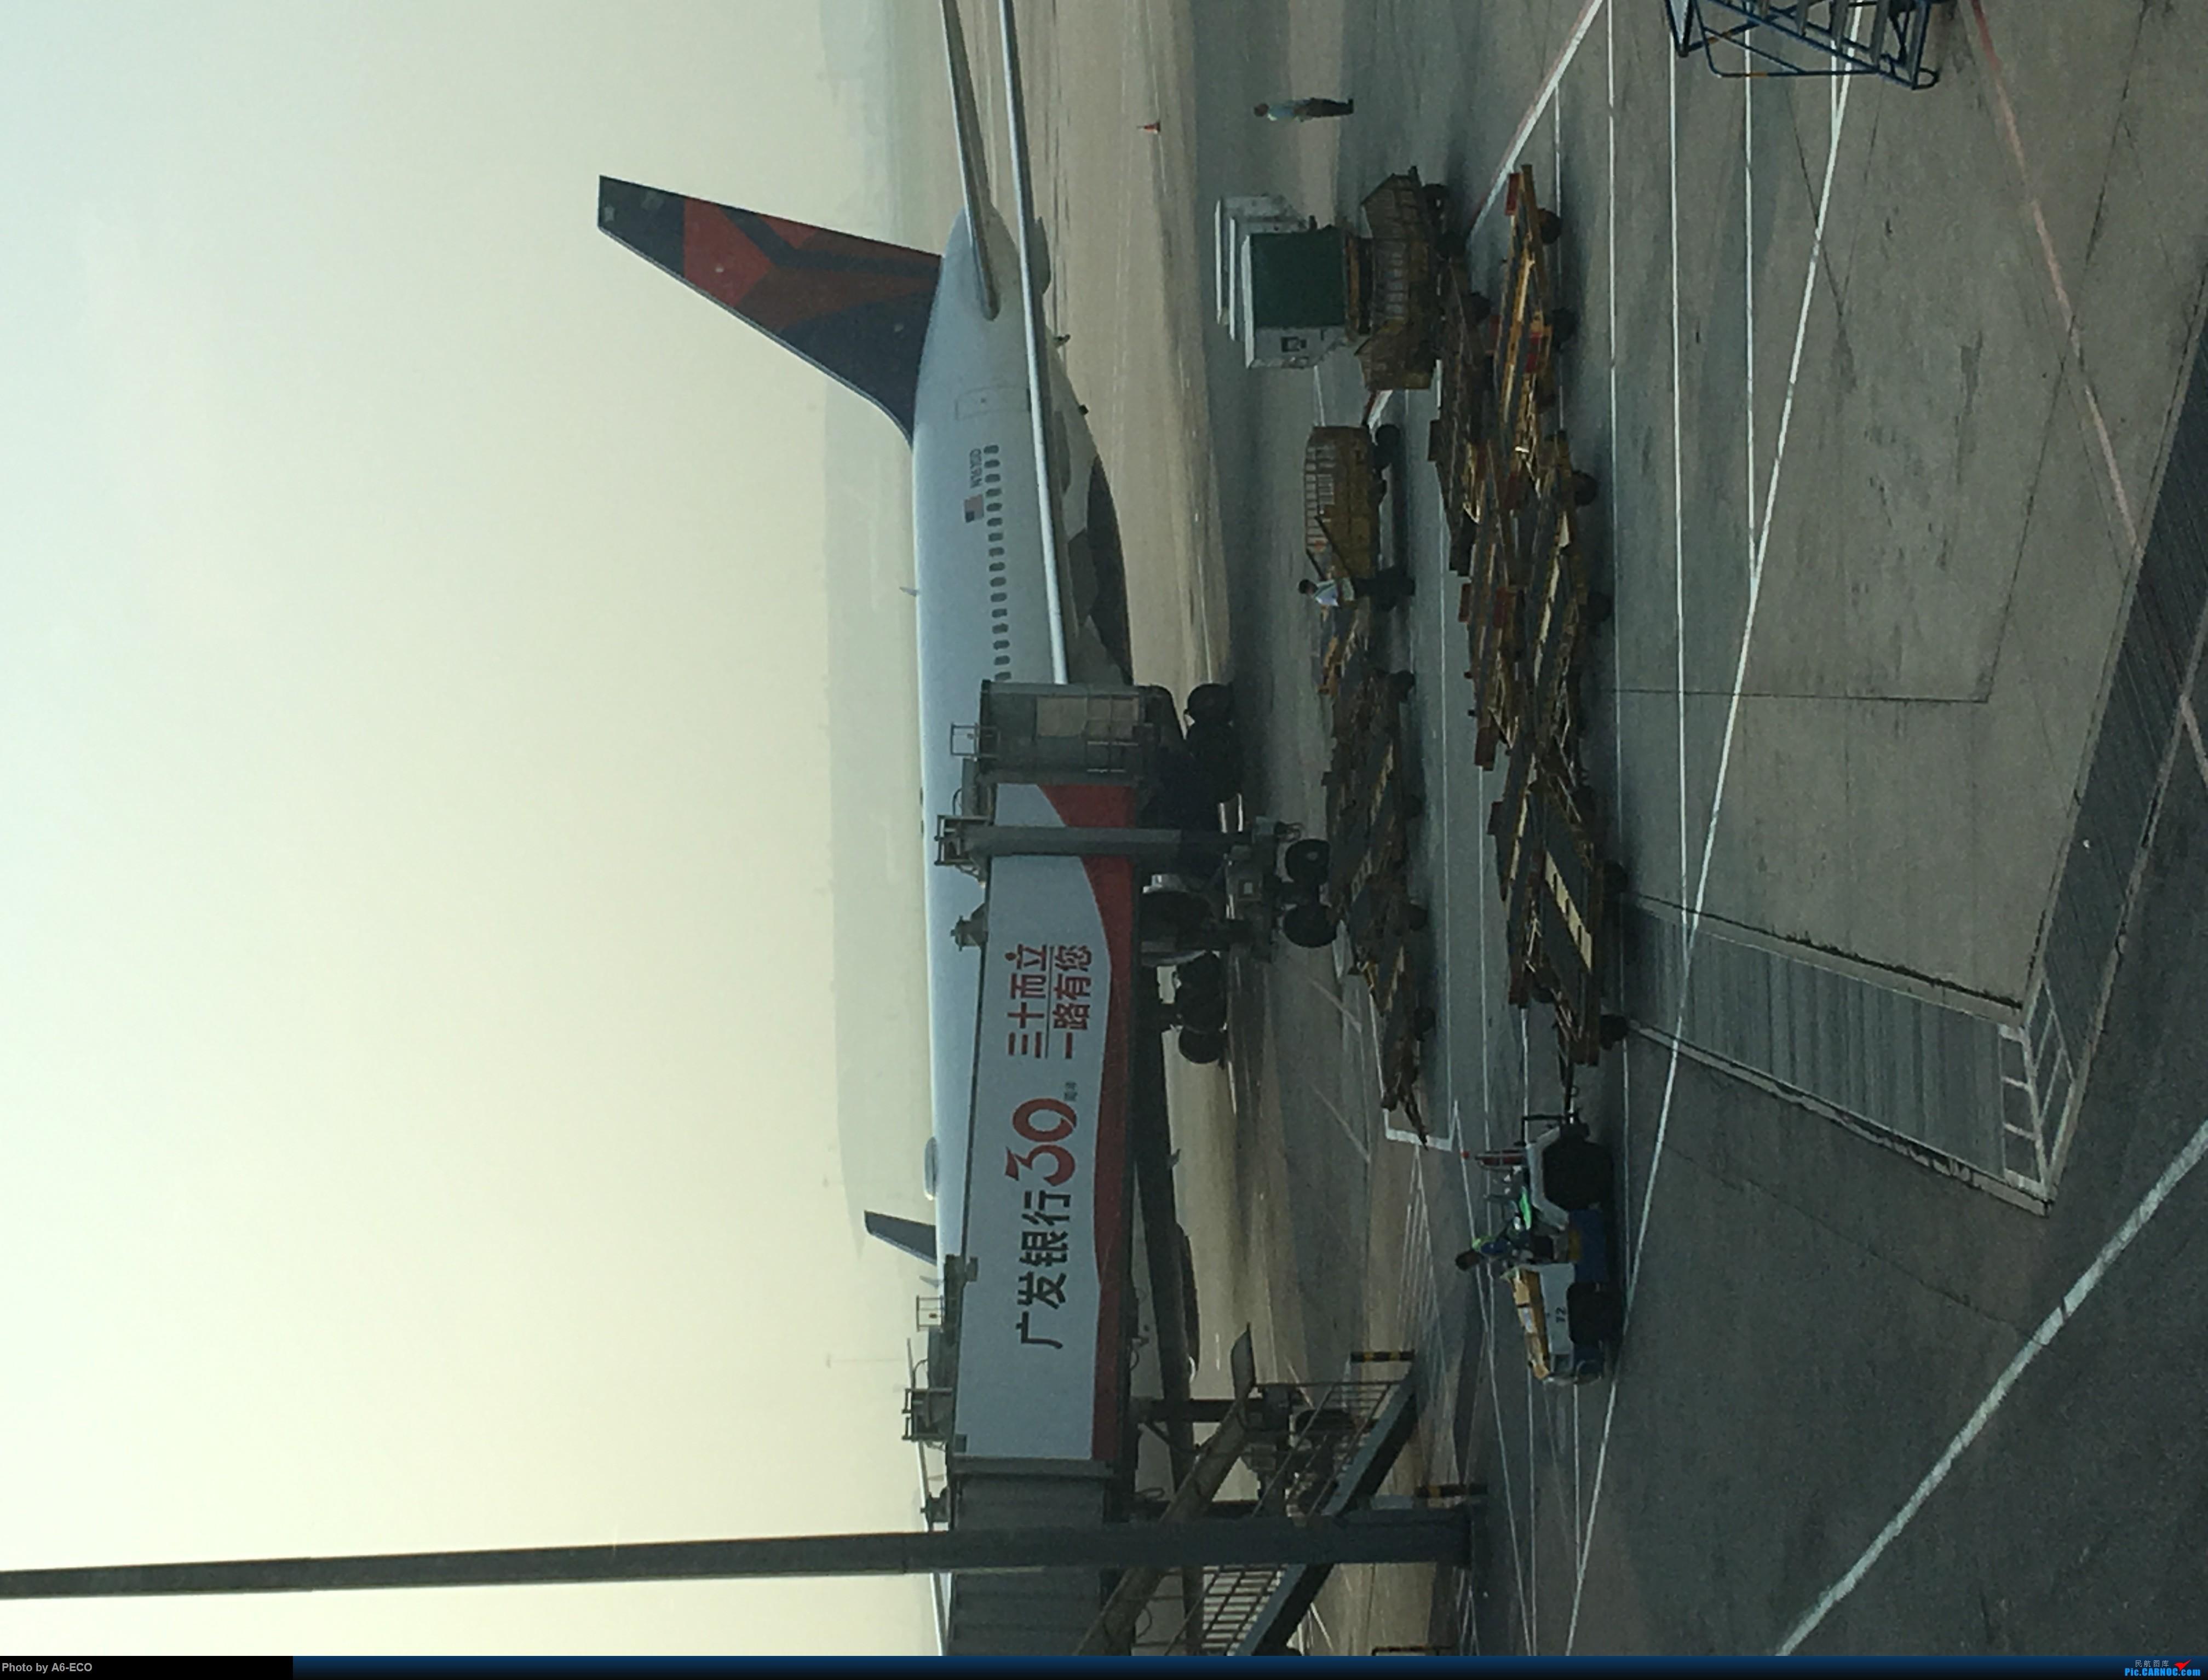 Re:[原创]海鲜航305航班+hxg拍机+香港推荐美食+回程海鲜航 BOEING 767-300ER N1610D 中国北京首都国际机场